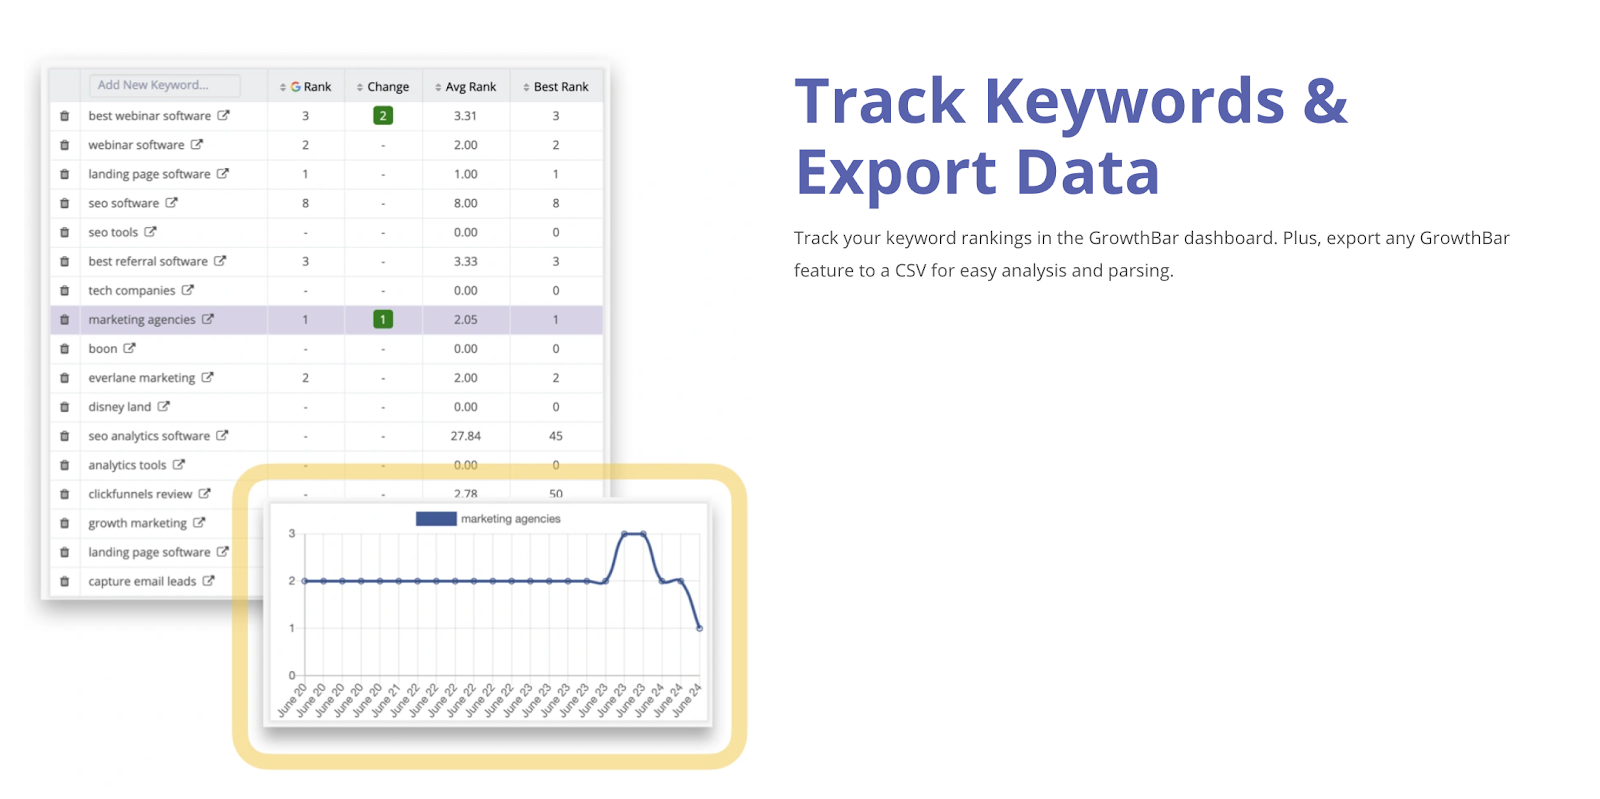 GrowthBar keyword tracking and export data tool